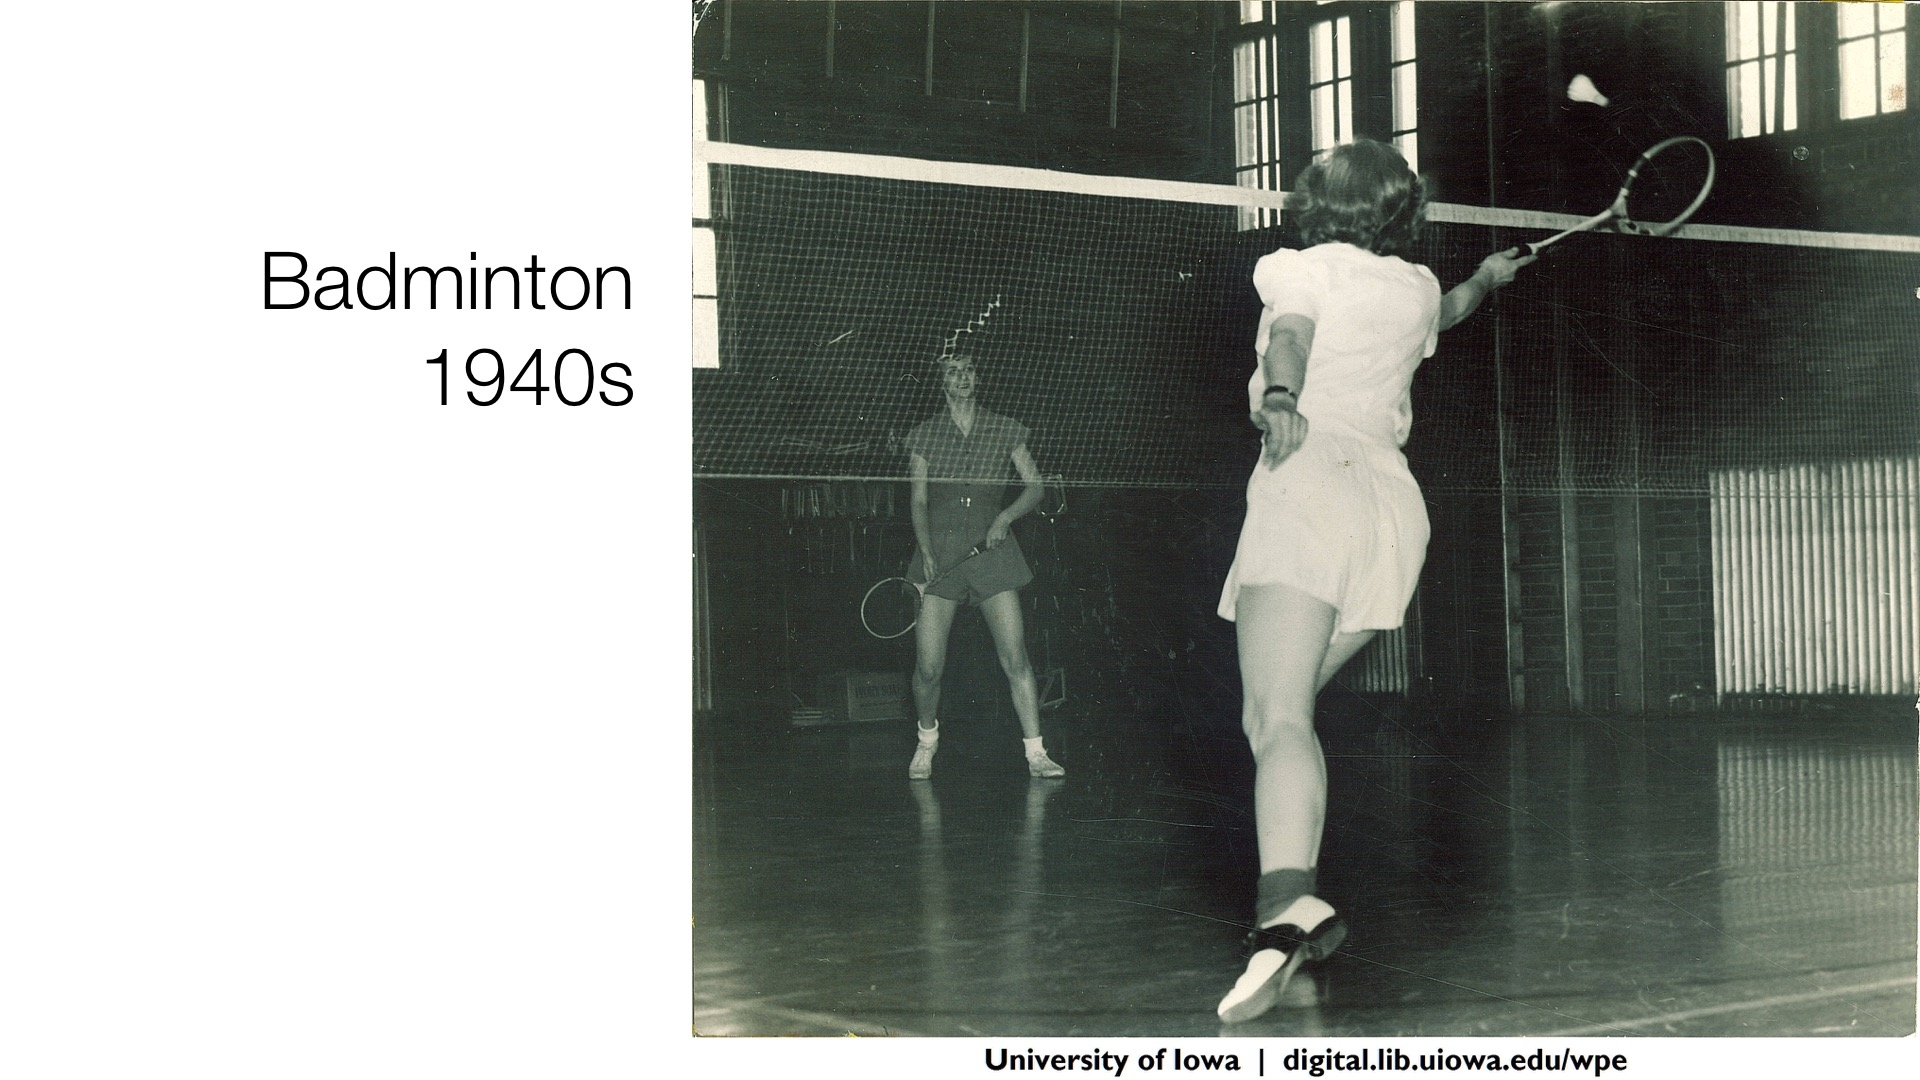 badminton class, 1940s